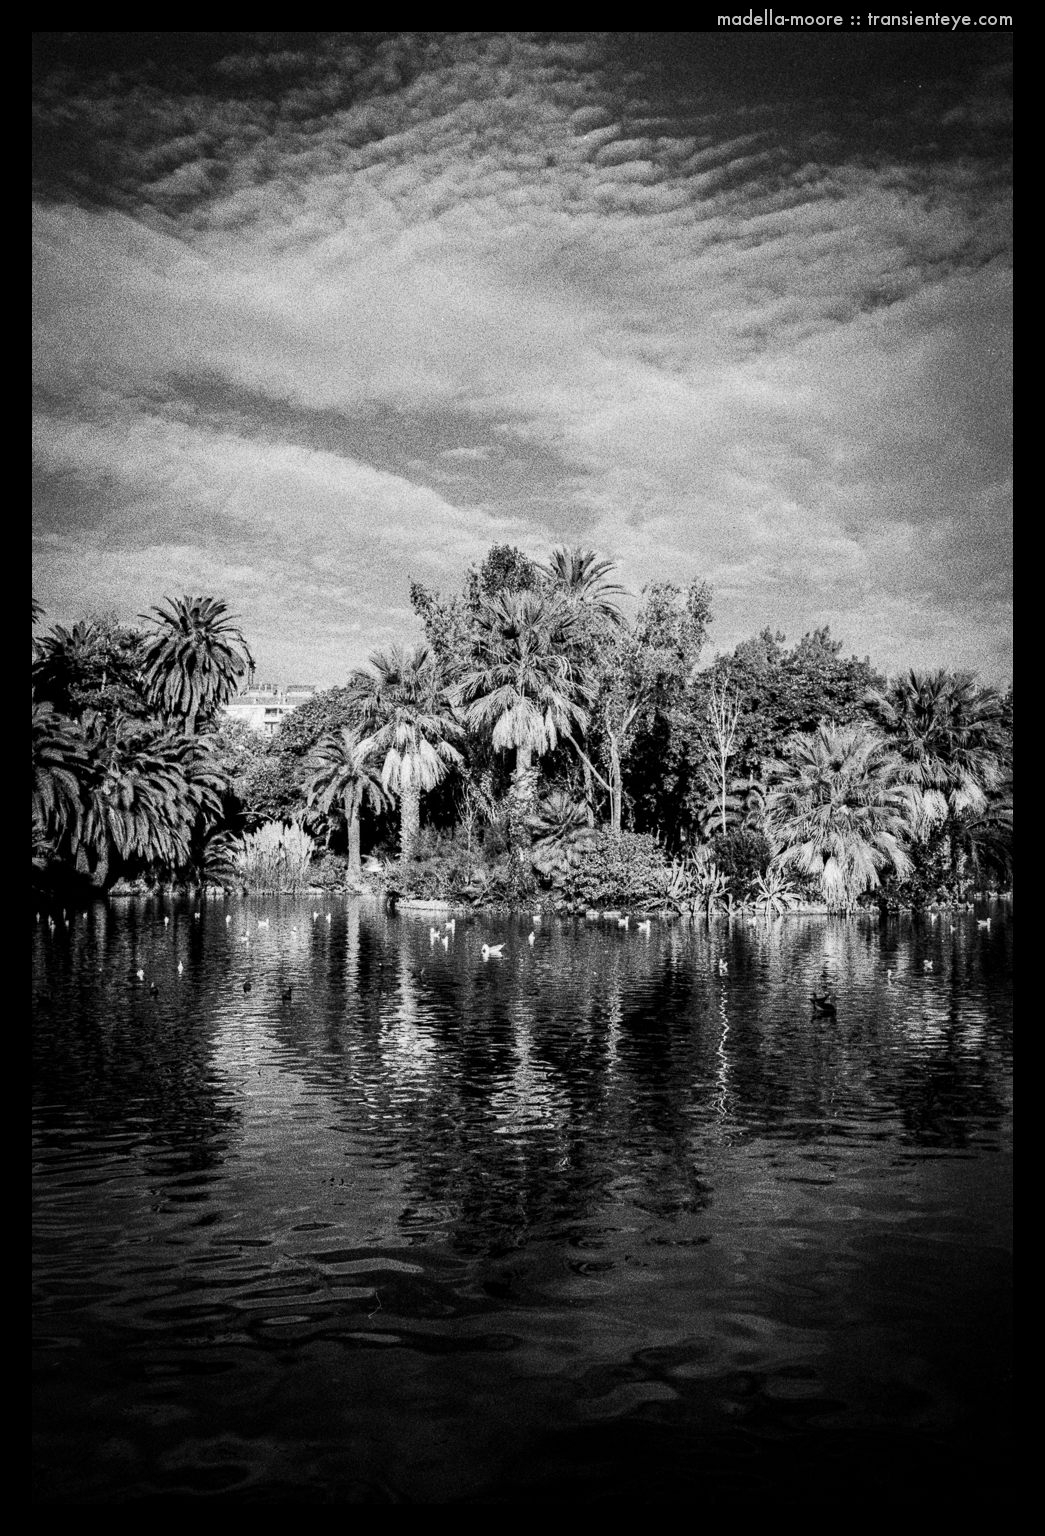 Parc de la Ciutadella, Barcelona. Leica M7,.